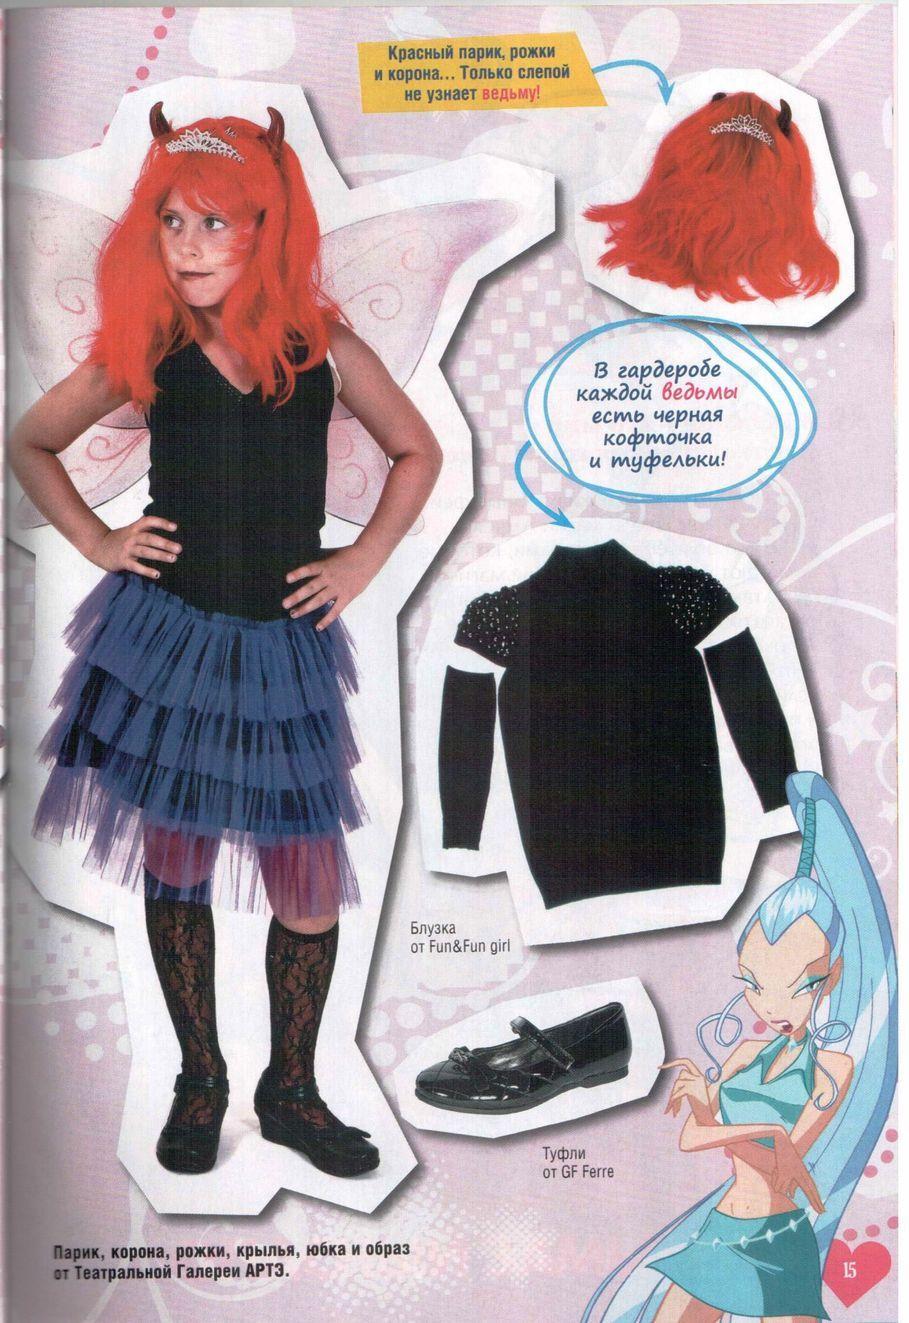 Комикс Винкс Winx - Опасный замысел (Журнал Винкс №10 2011) - стр. 15